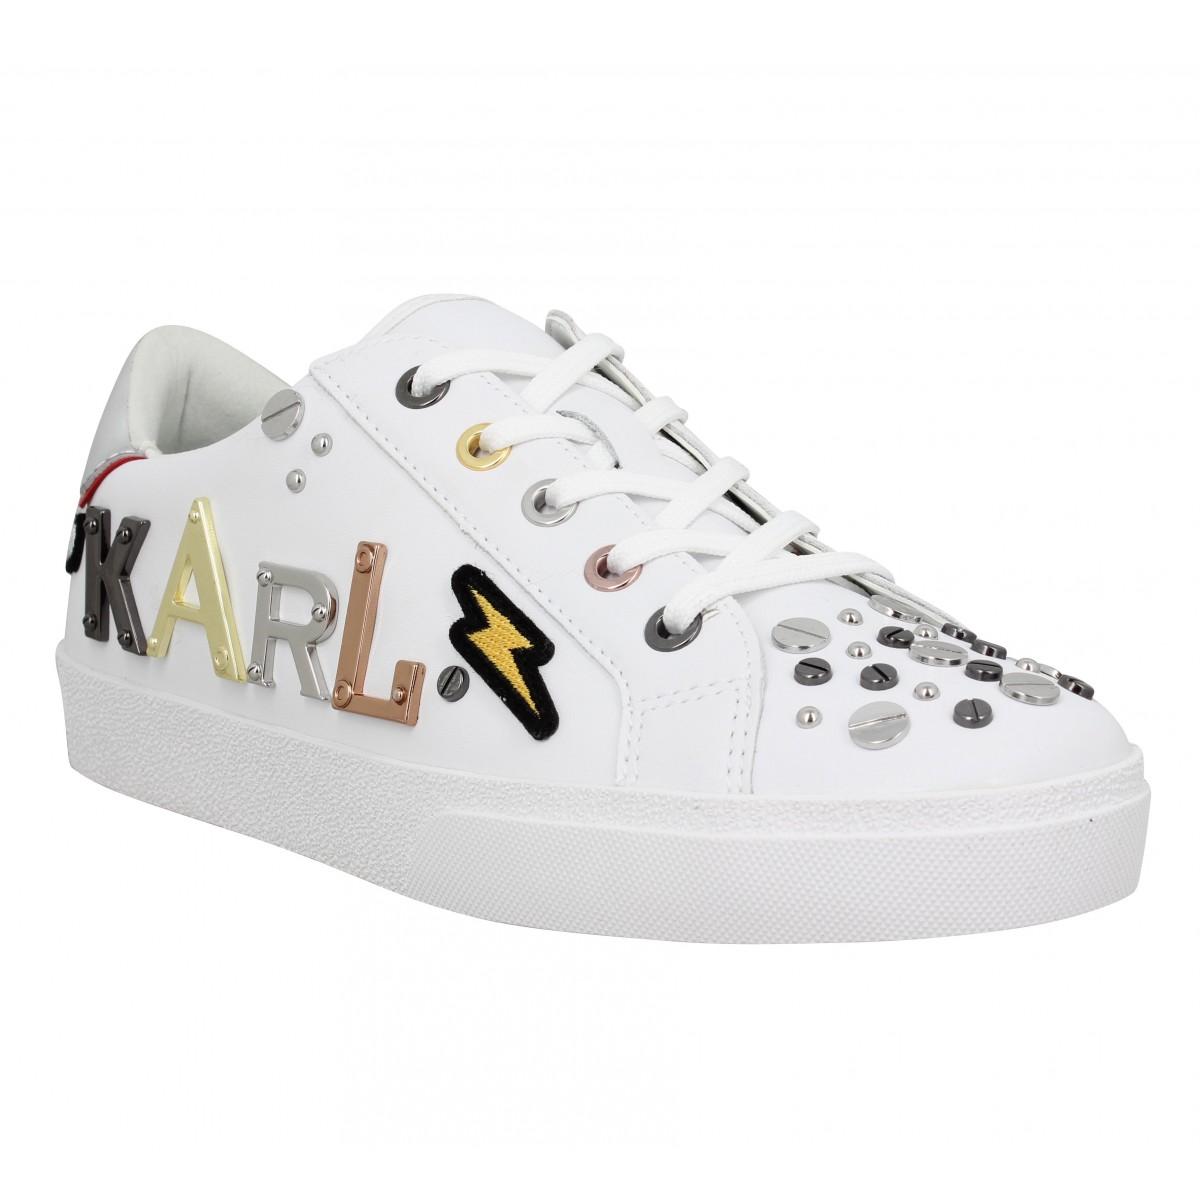 Baskets KARL LAGERFELD Skool Karl The Robot Lo cuir Femme Blanc Argent